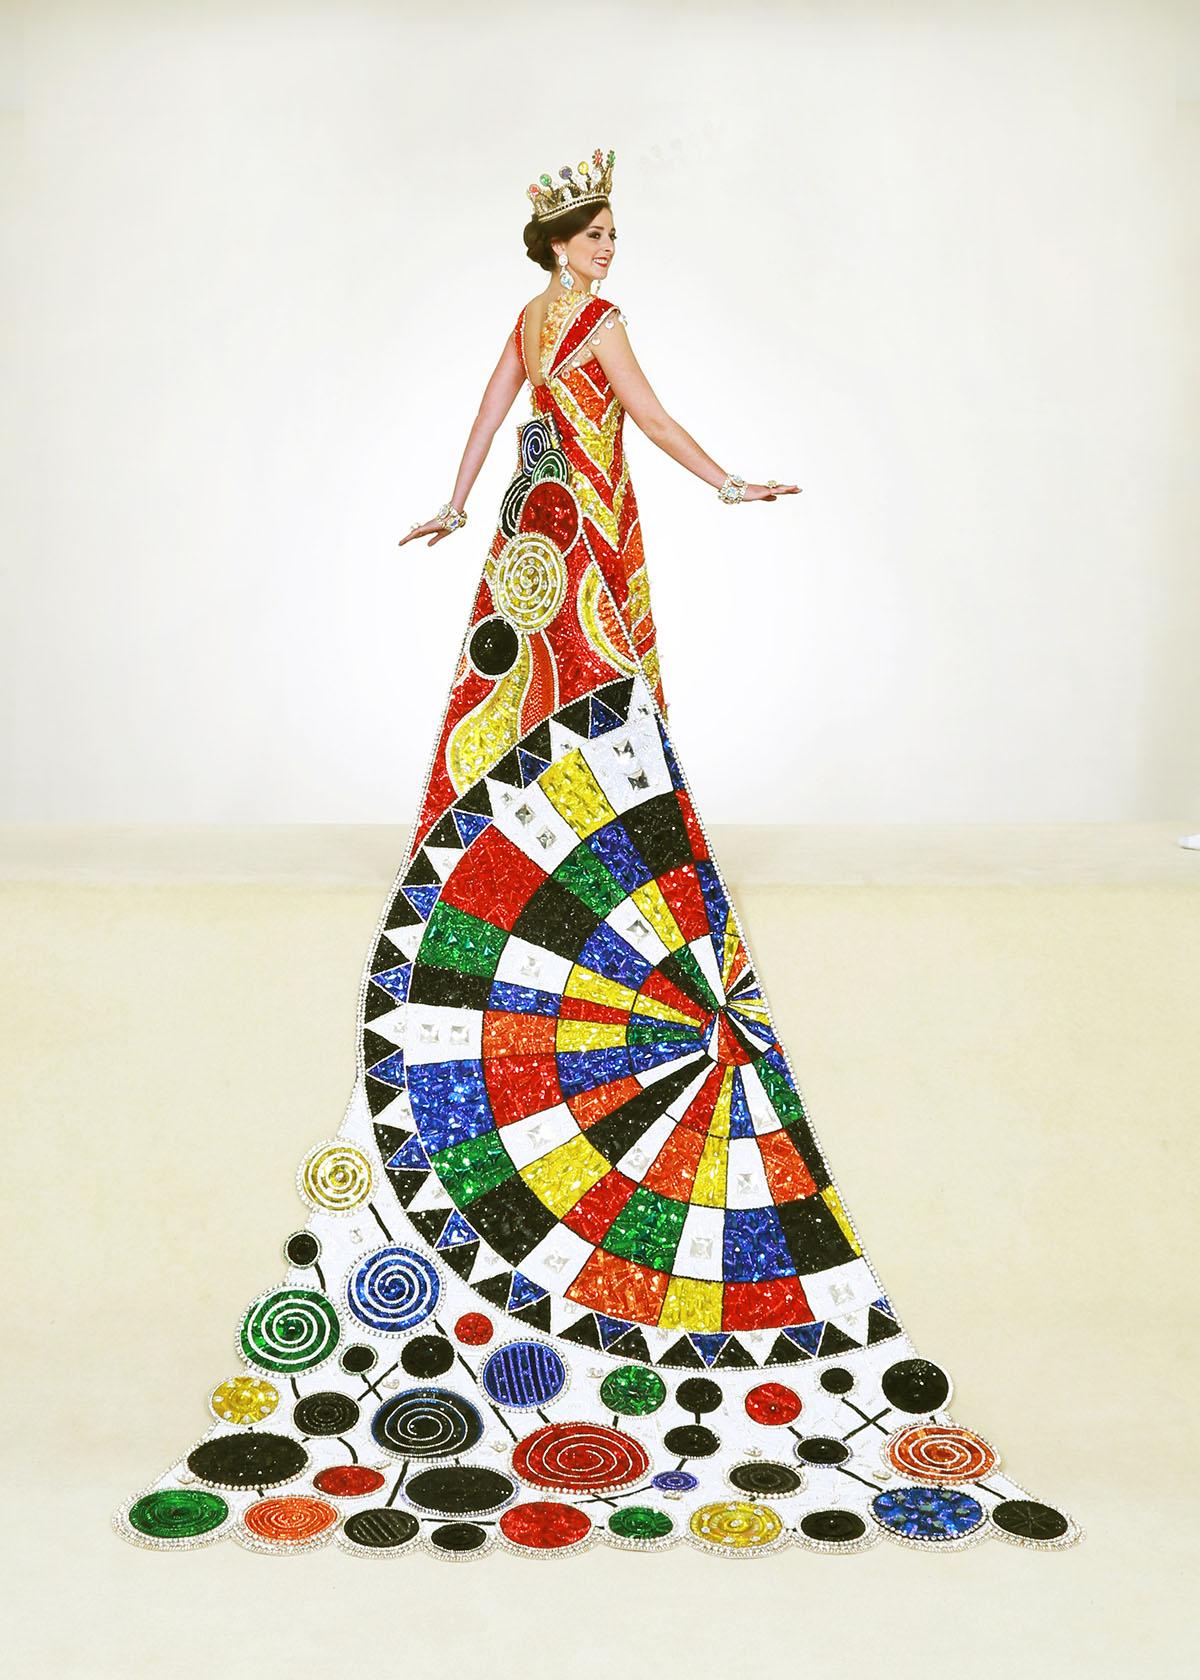 Elizabeth Davis, Duchess Of Whimsical Artistic Expression